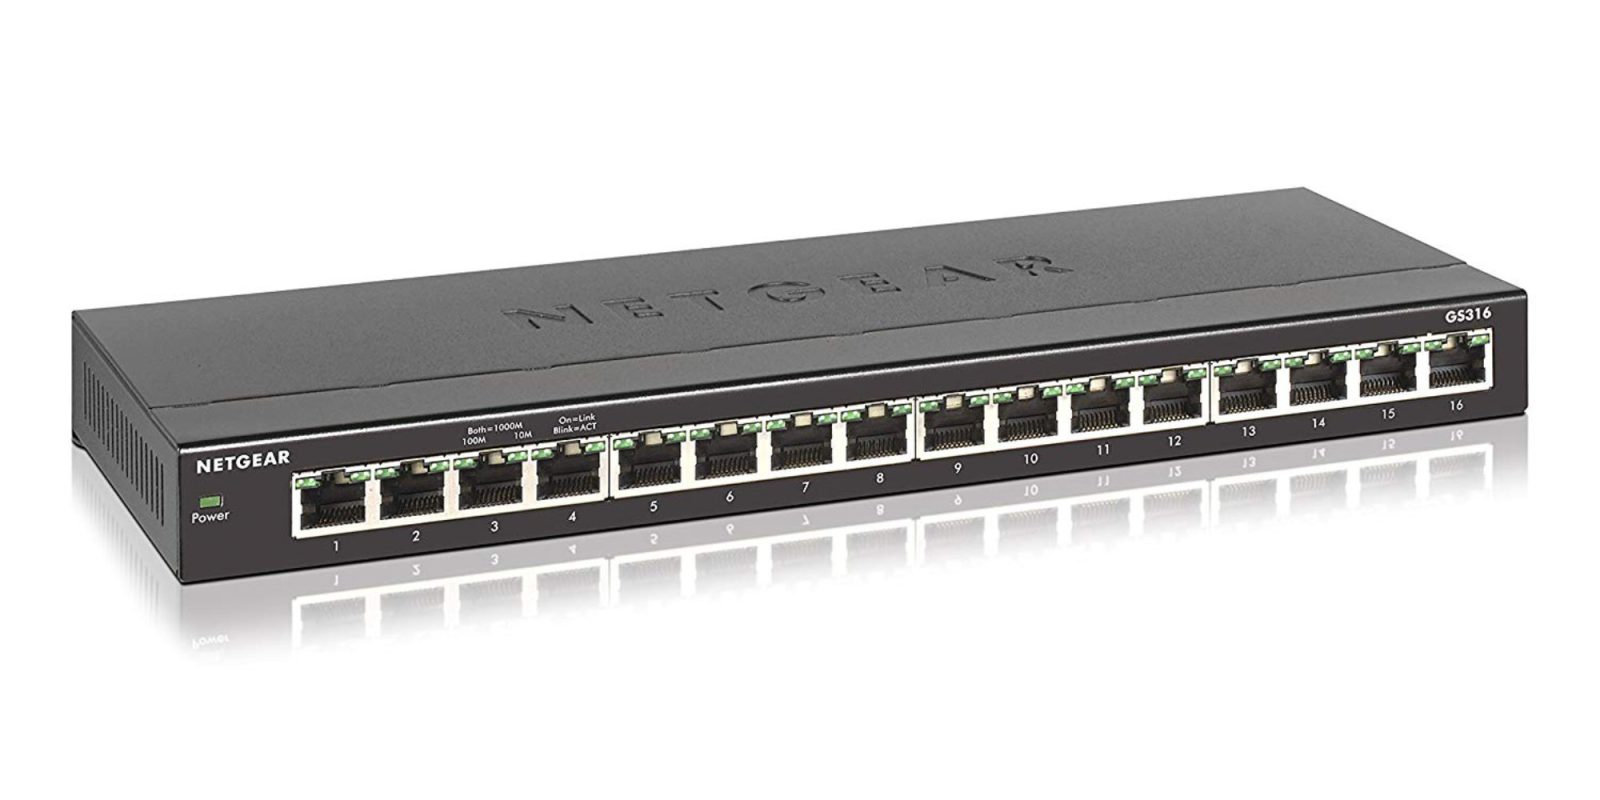 Surge network reliability w/ NETGEAR's 16-Port Gigabit Ethernet Switch: $44 (Reg. $70)